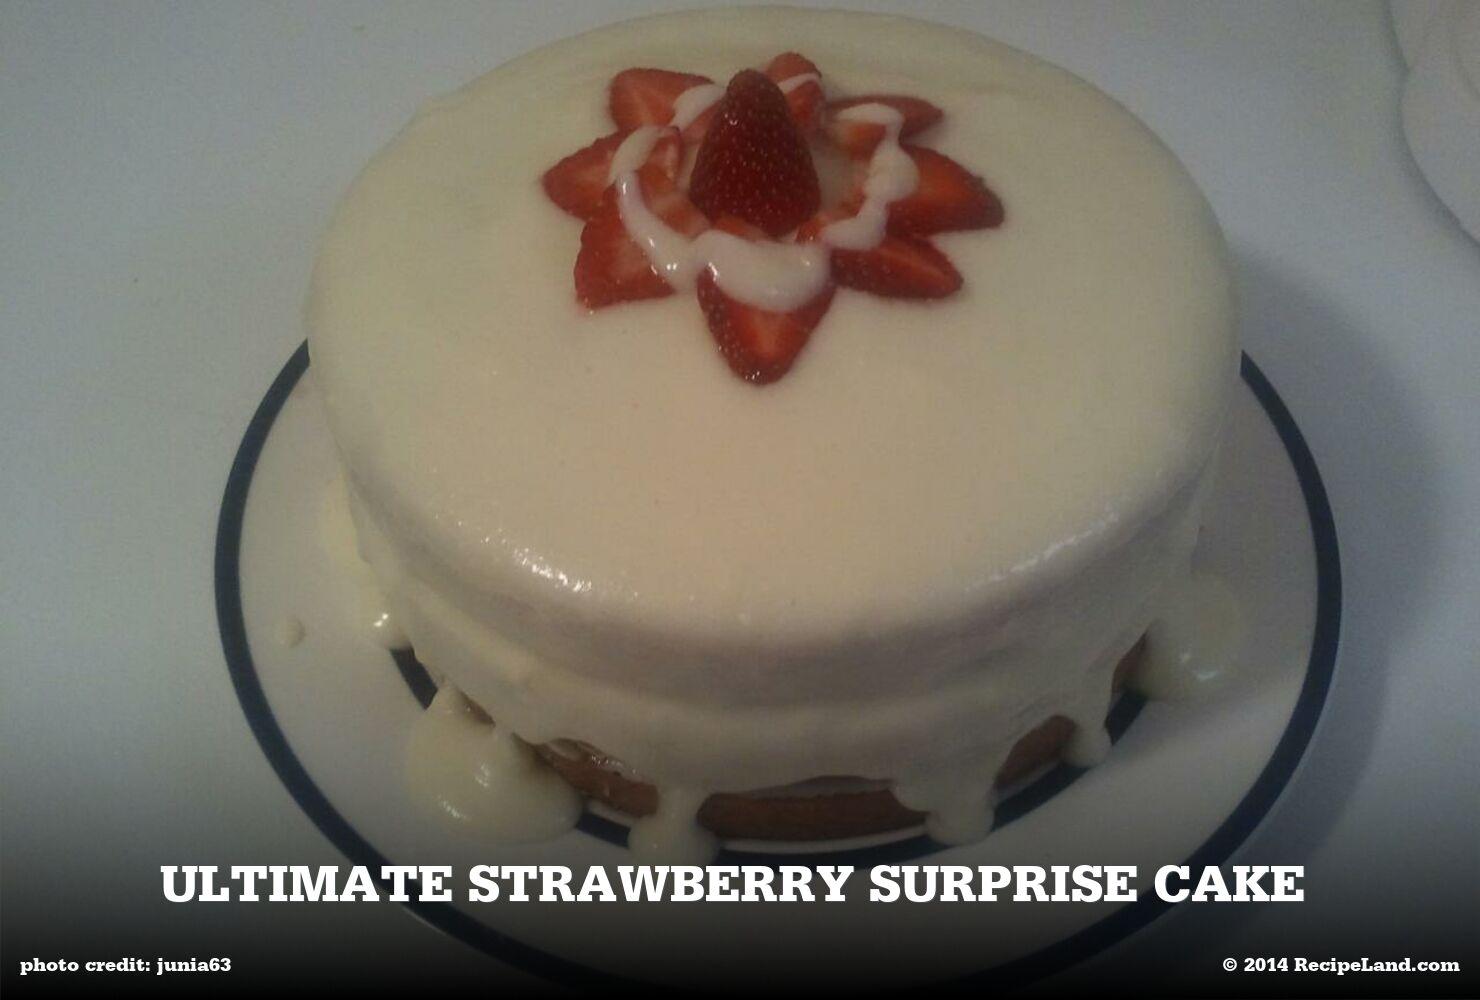 Ultimate Strawberry Surprise Cake